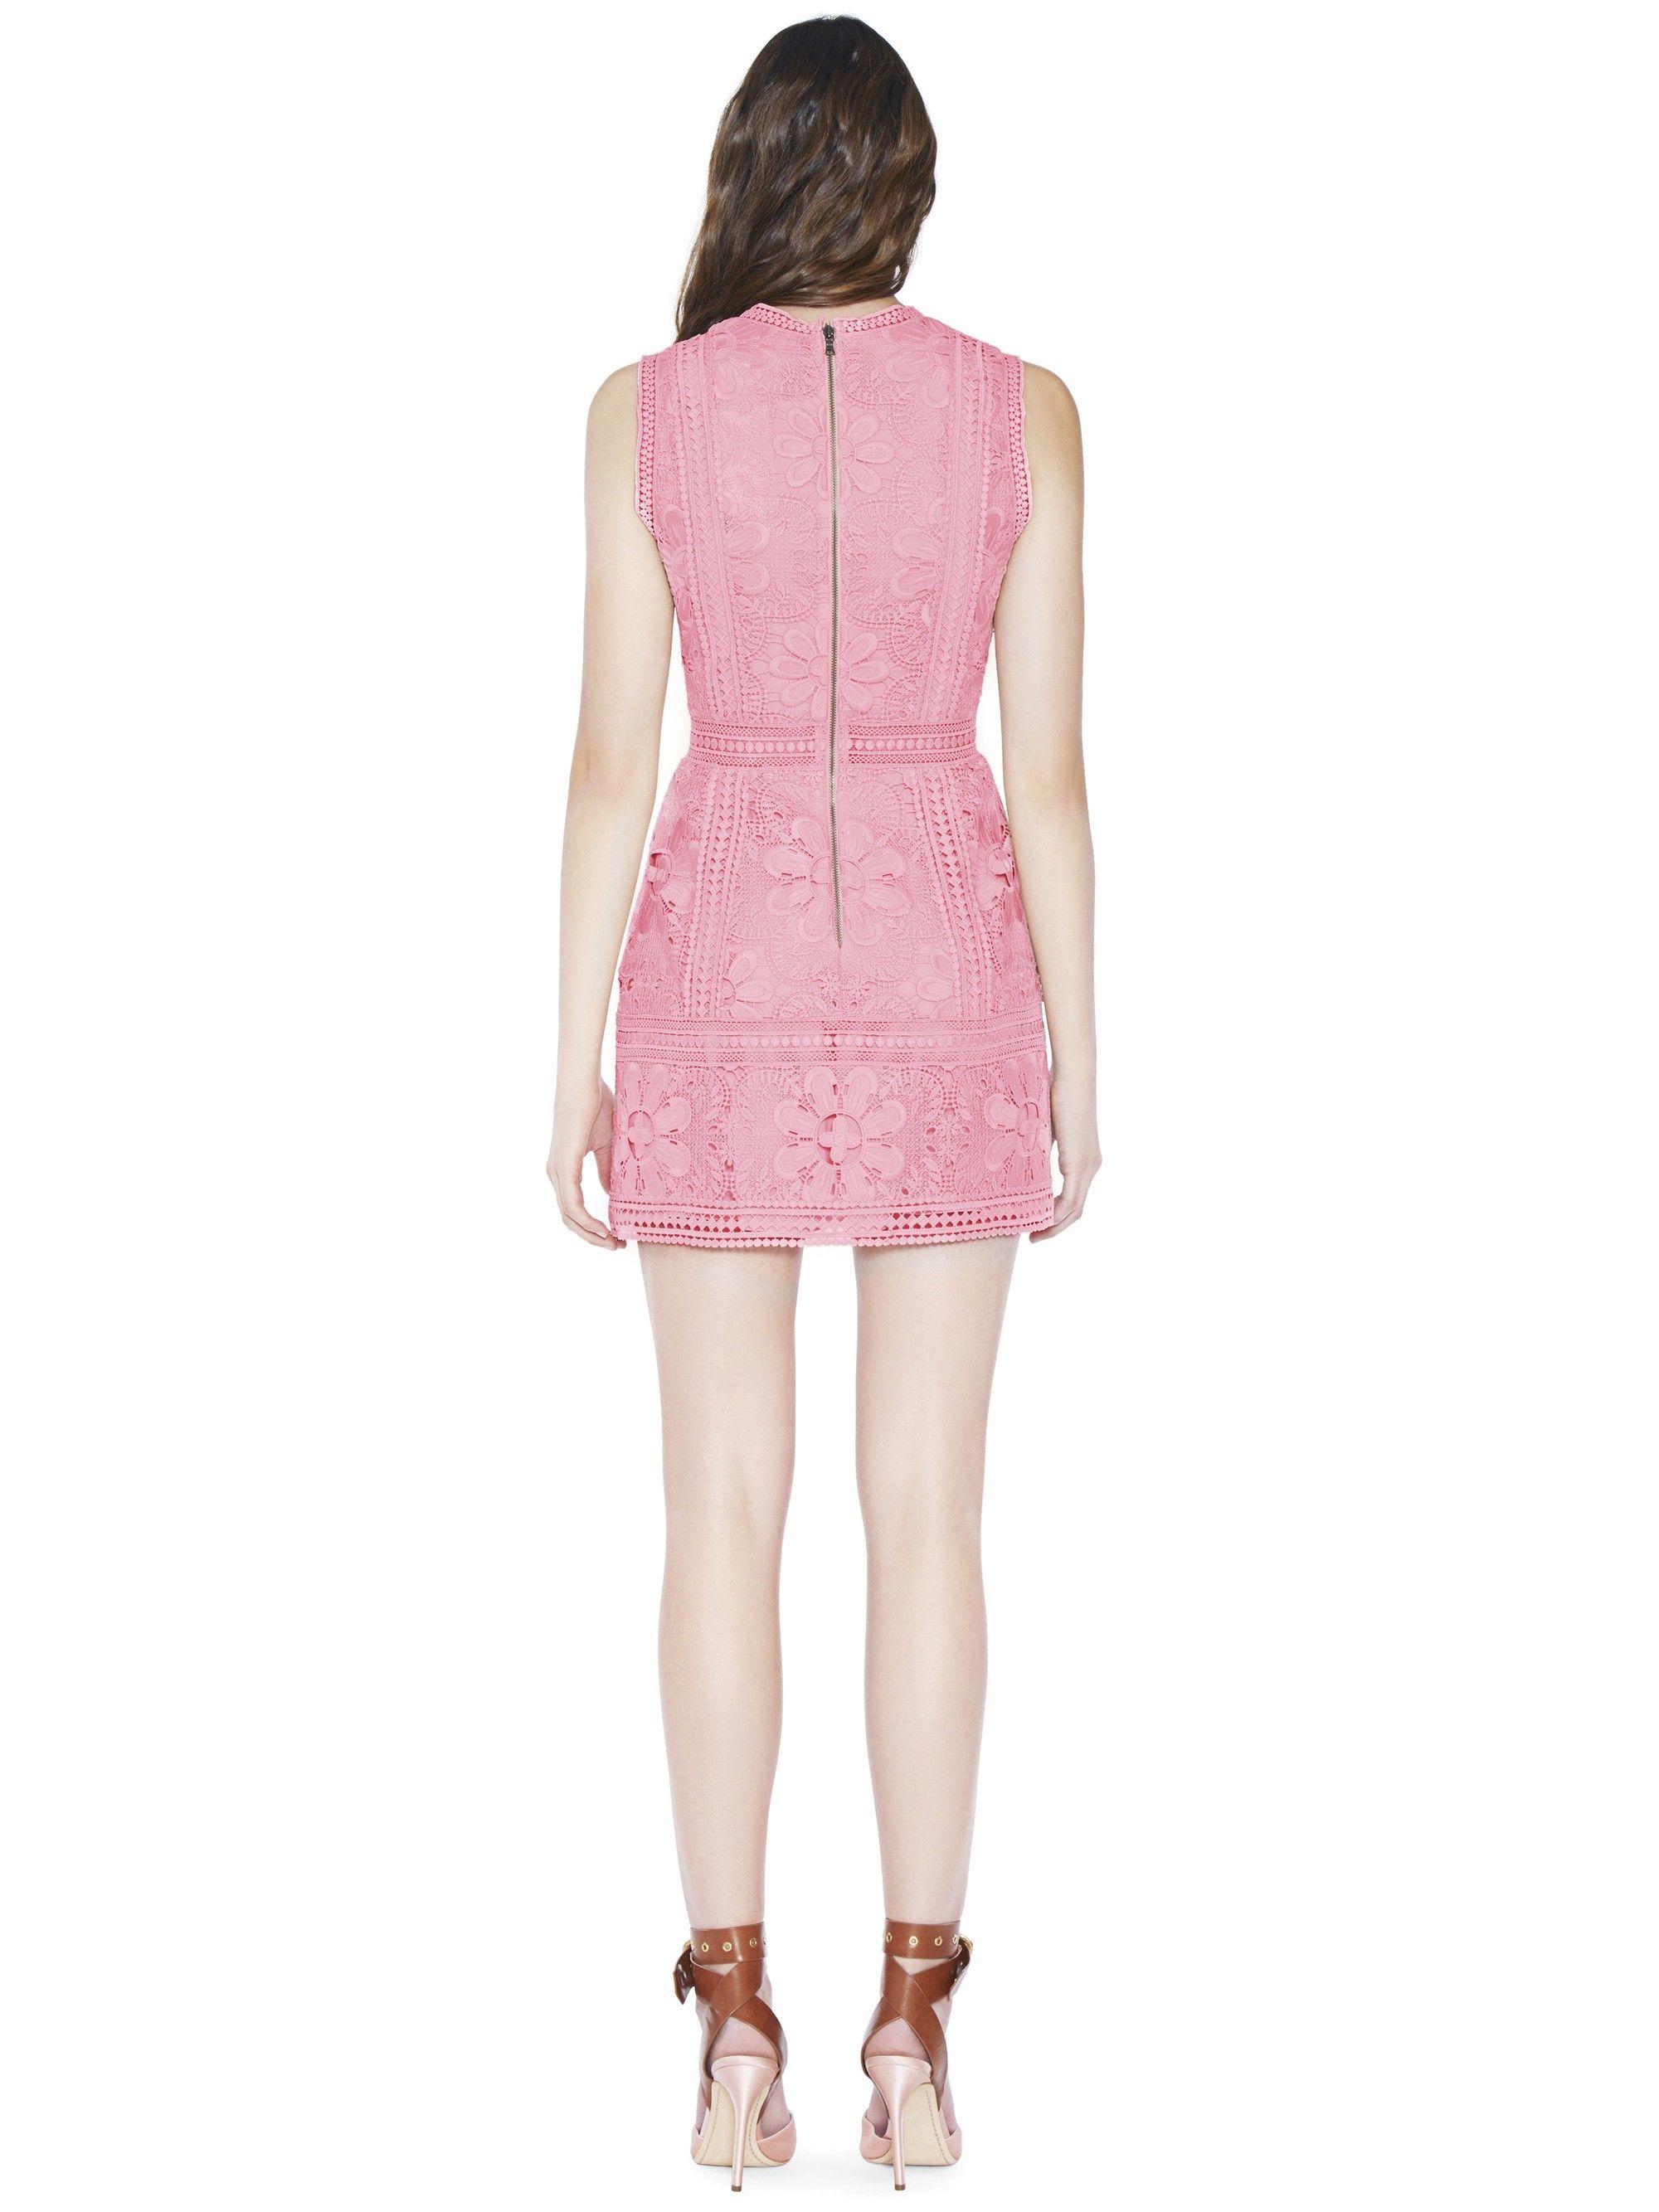 4981421a4814 Alice + Olivia Zula Lace Combo V-Neck Party Dress - 12 | Products ...